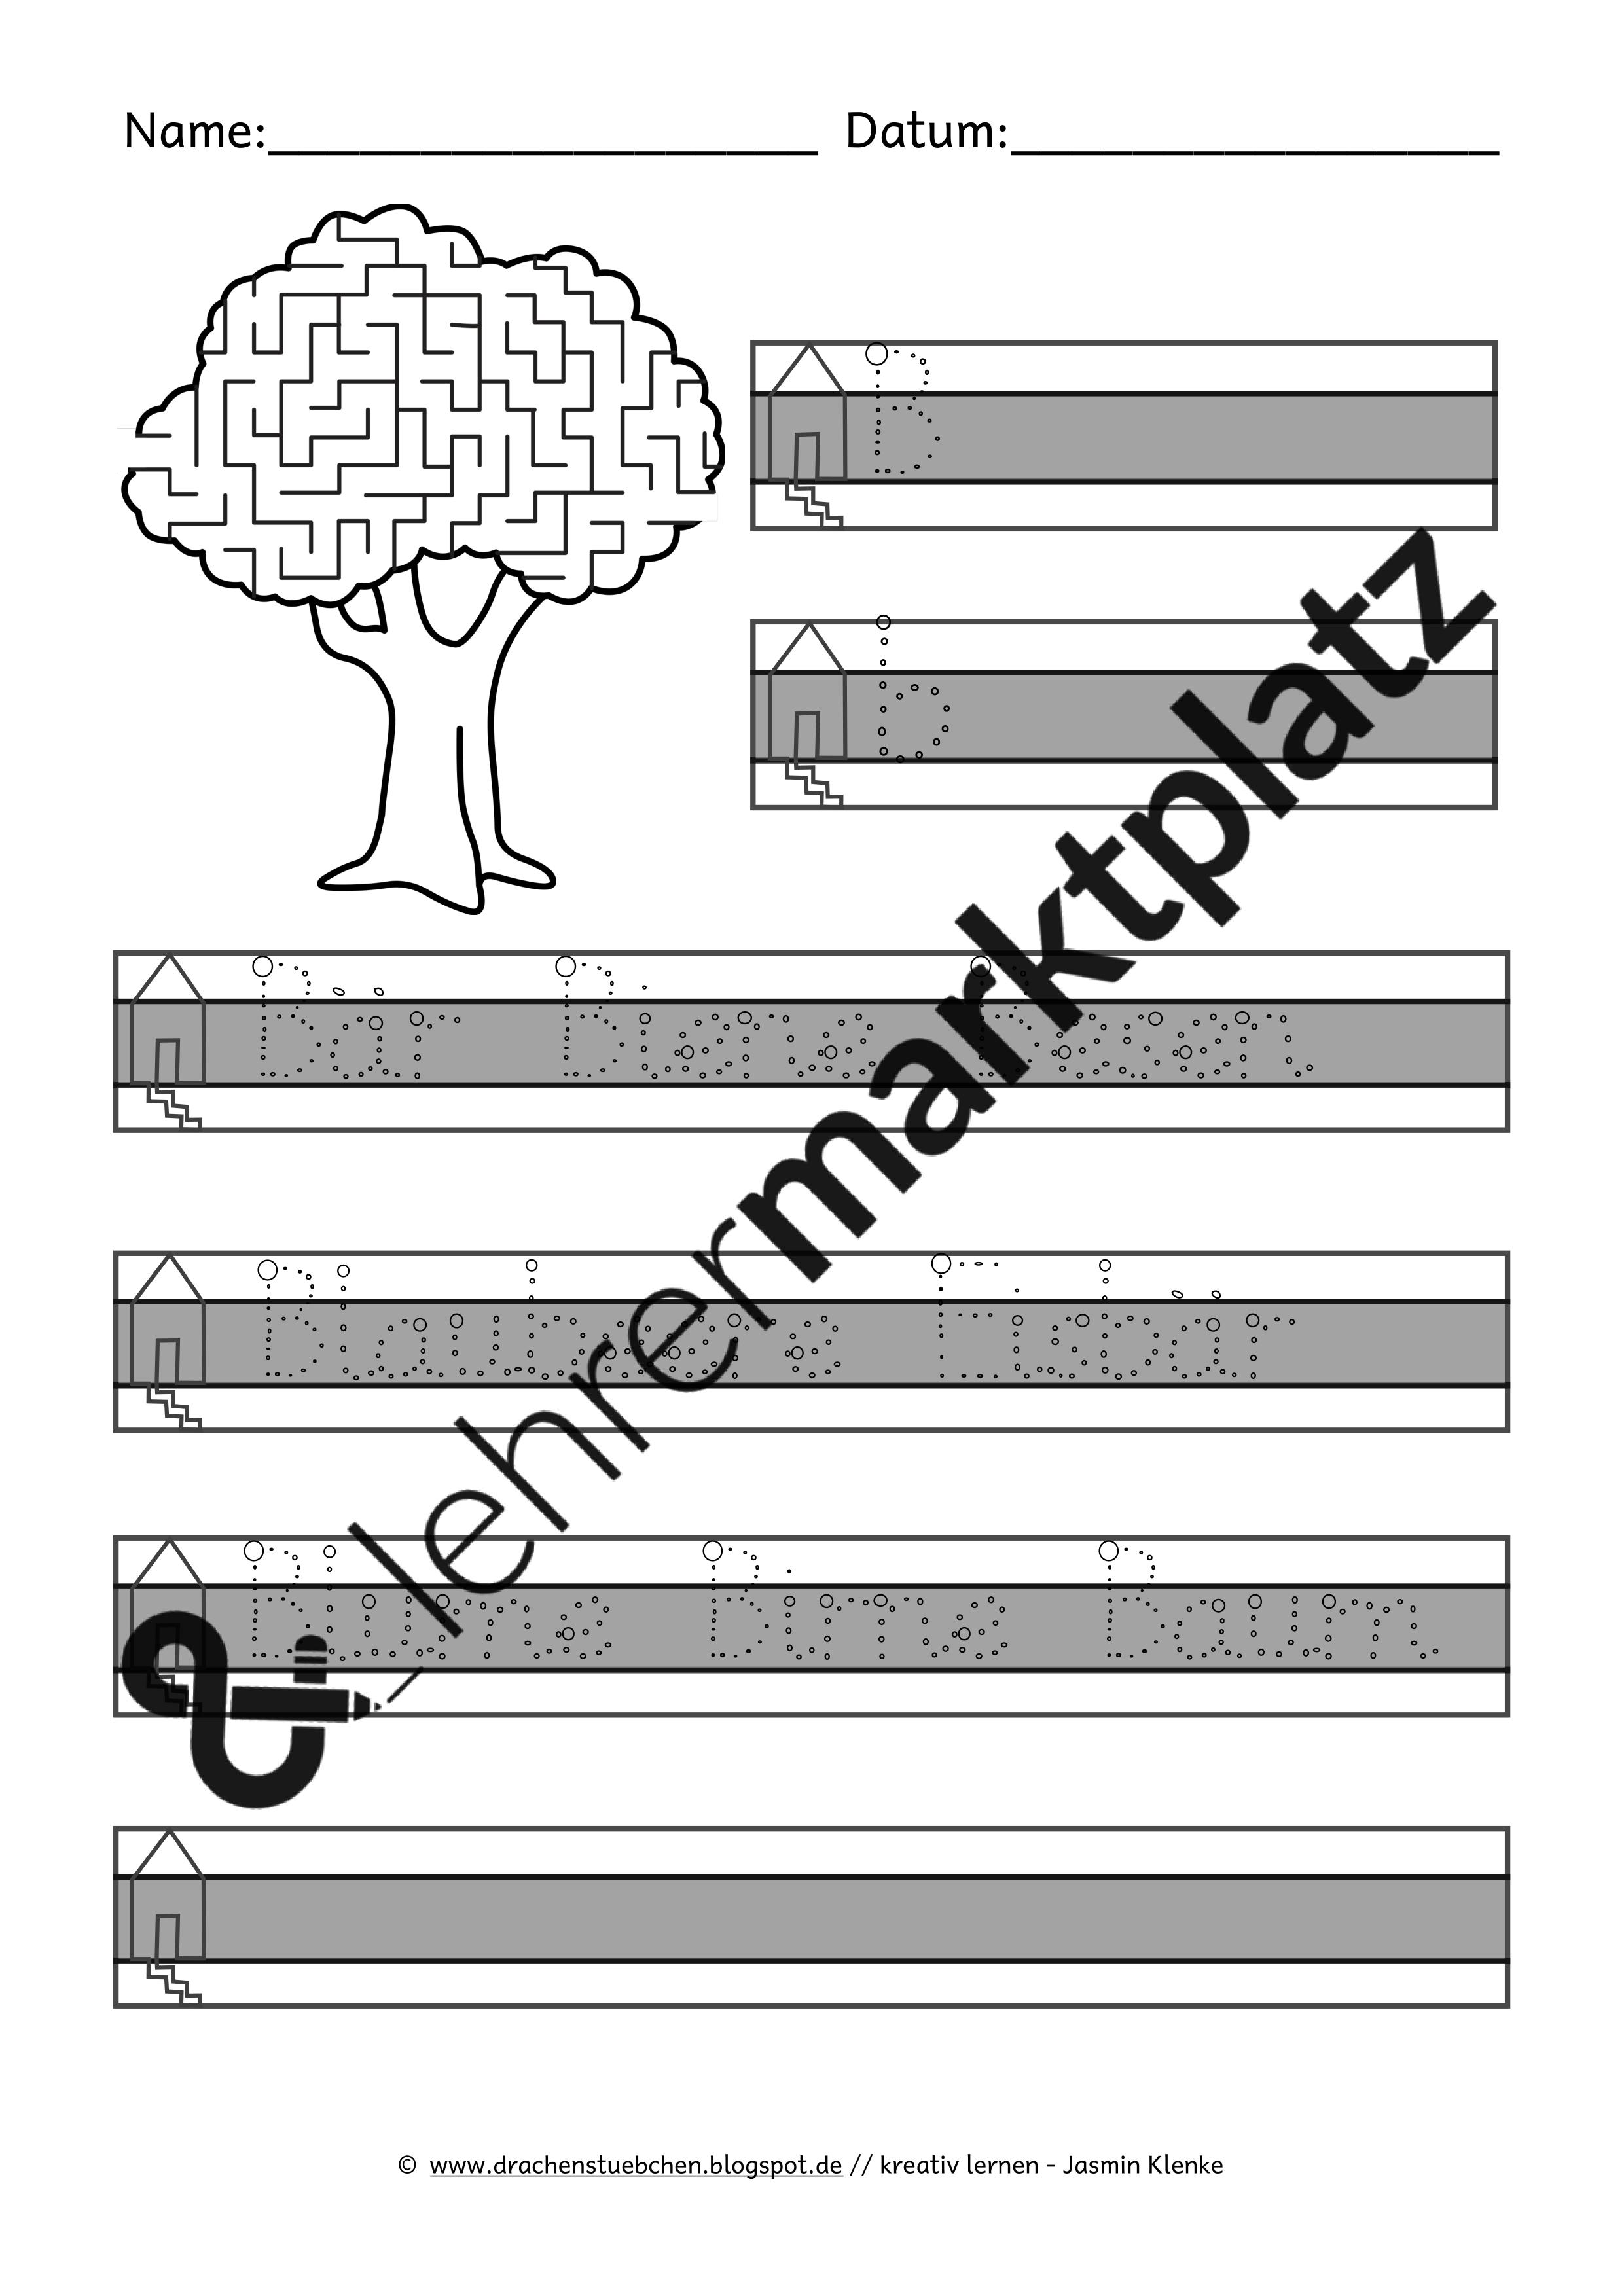 komplettset f r den schreiblehrgang alle buchstaben in grundschrift 200 arbeitsbl tter. Black Bedroom Furniture Sets. Home Design Ideas